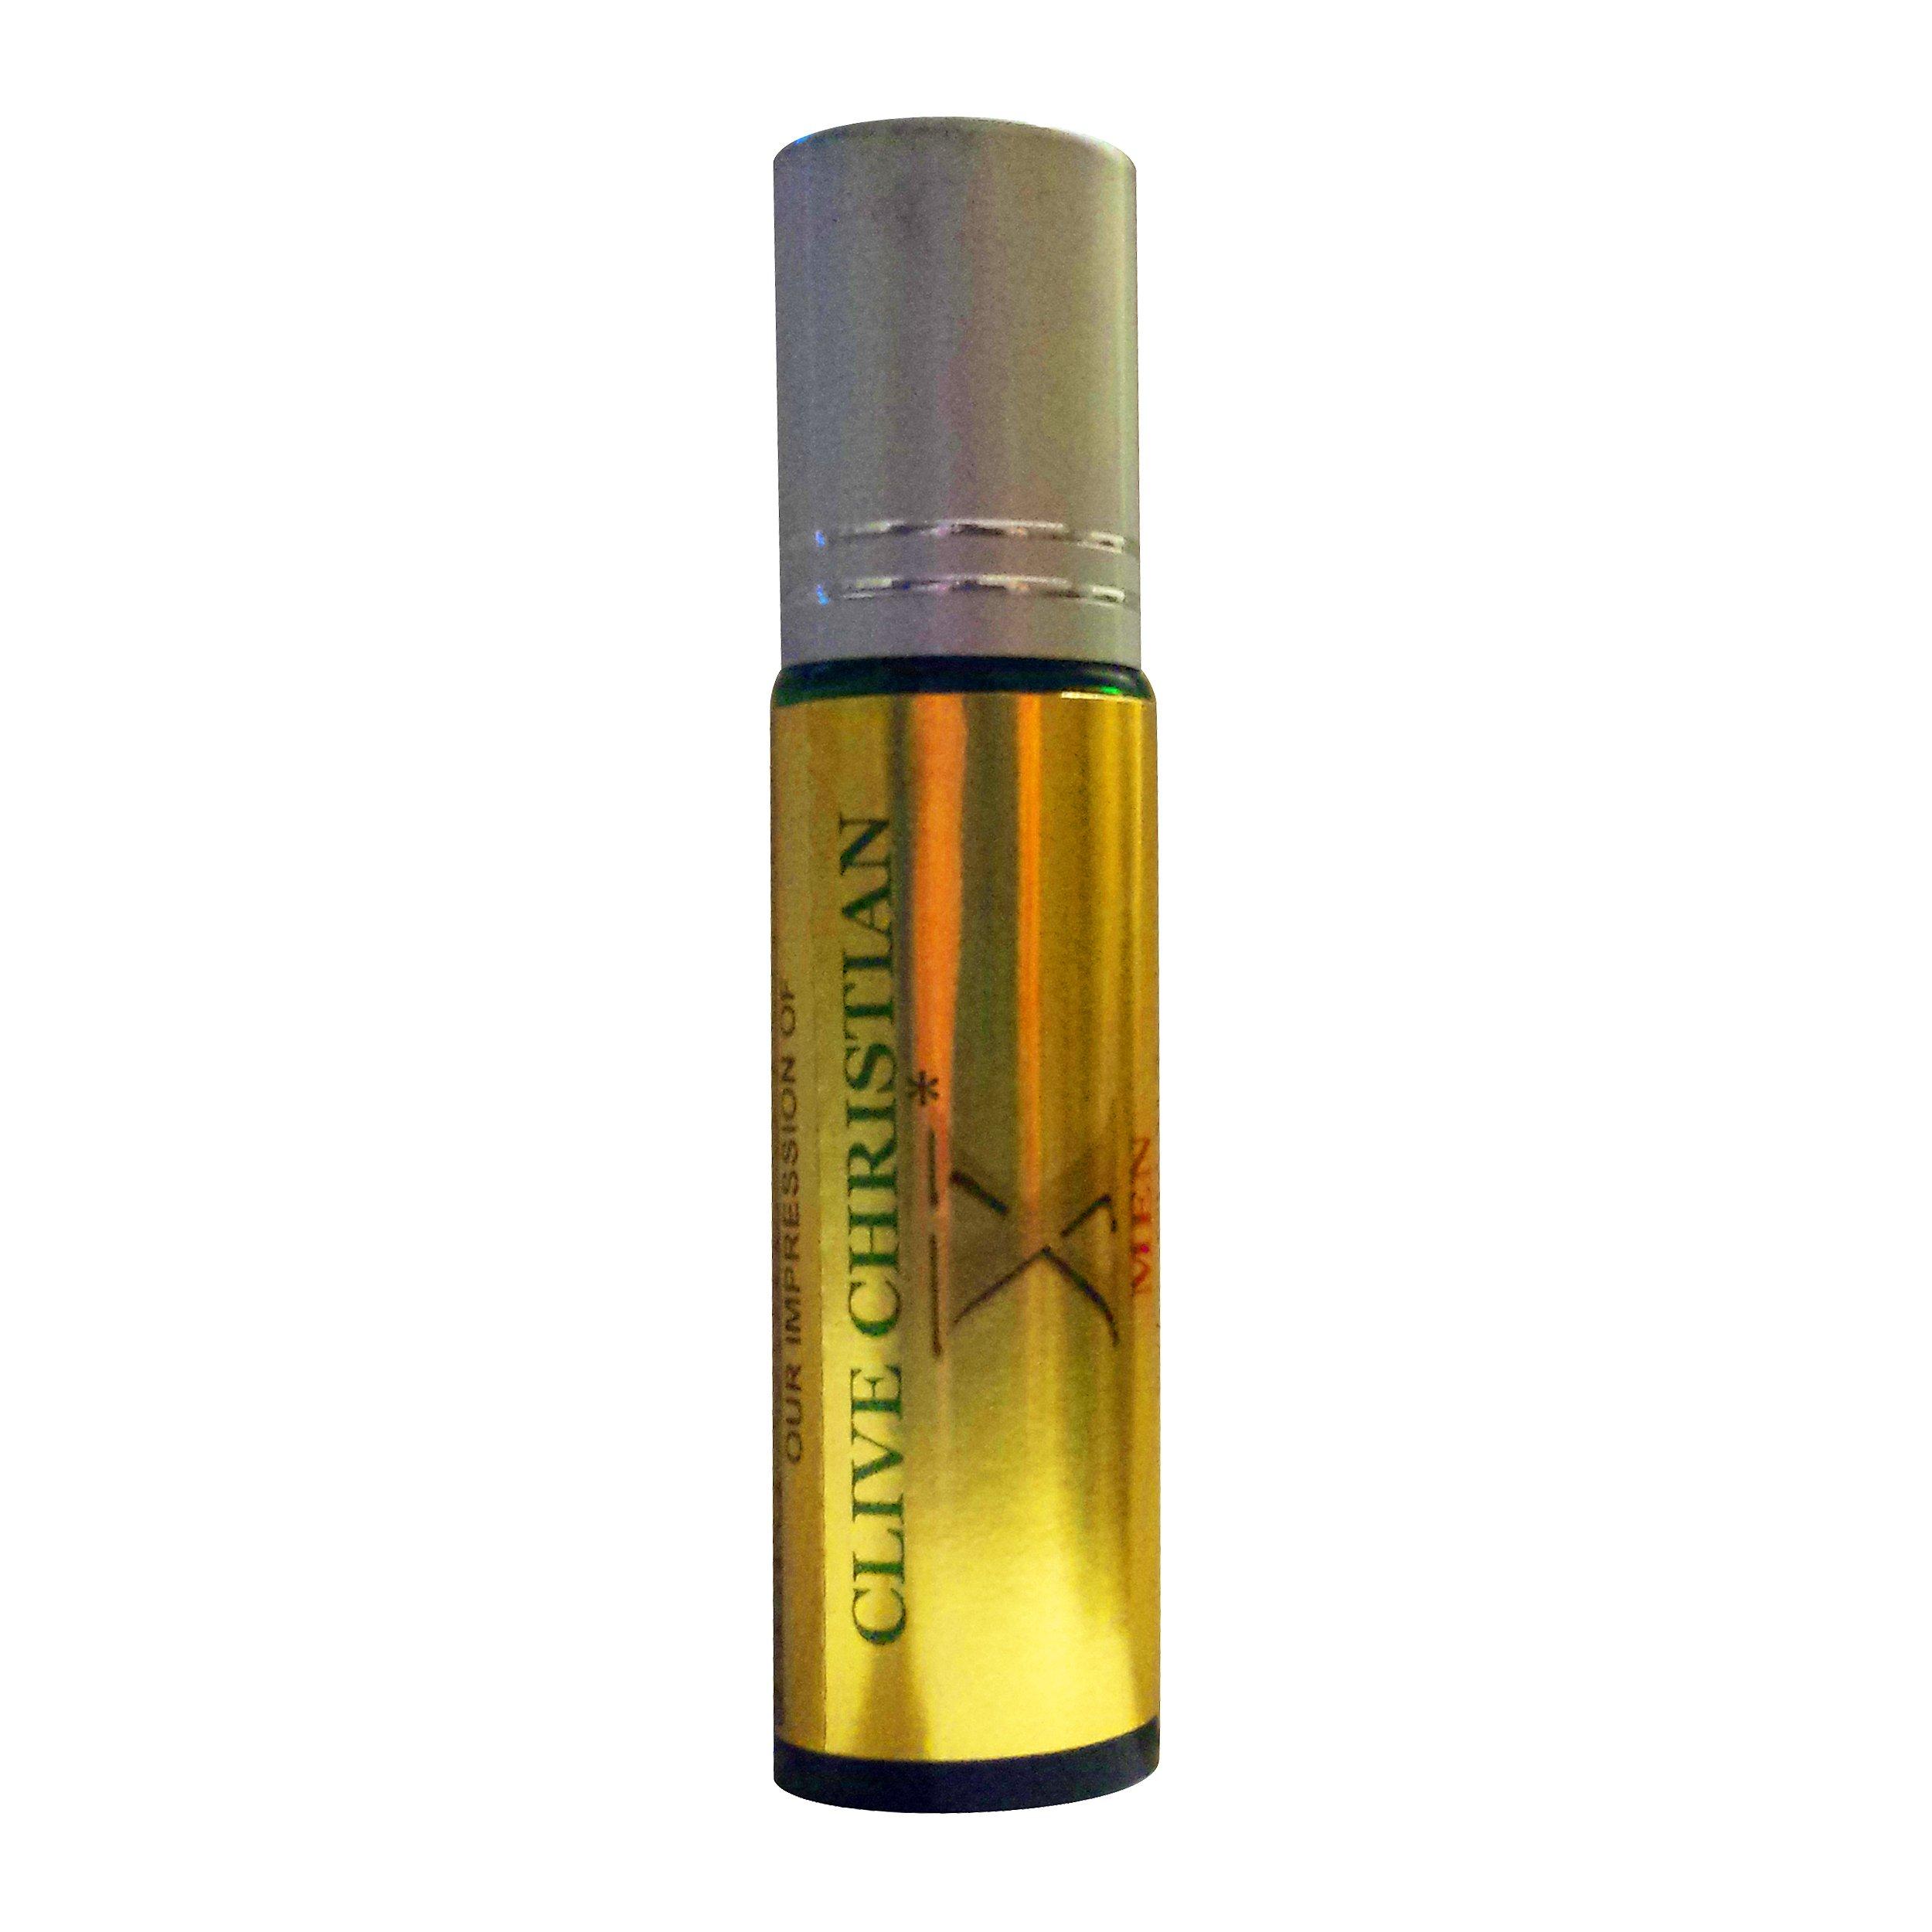 Perfume Studio Superior Impression Ofclive Christian L 100 Parfum Original Premium X For Men 10ml Roll On Green Glass Silver